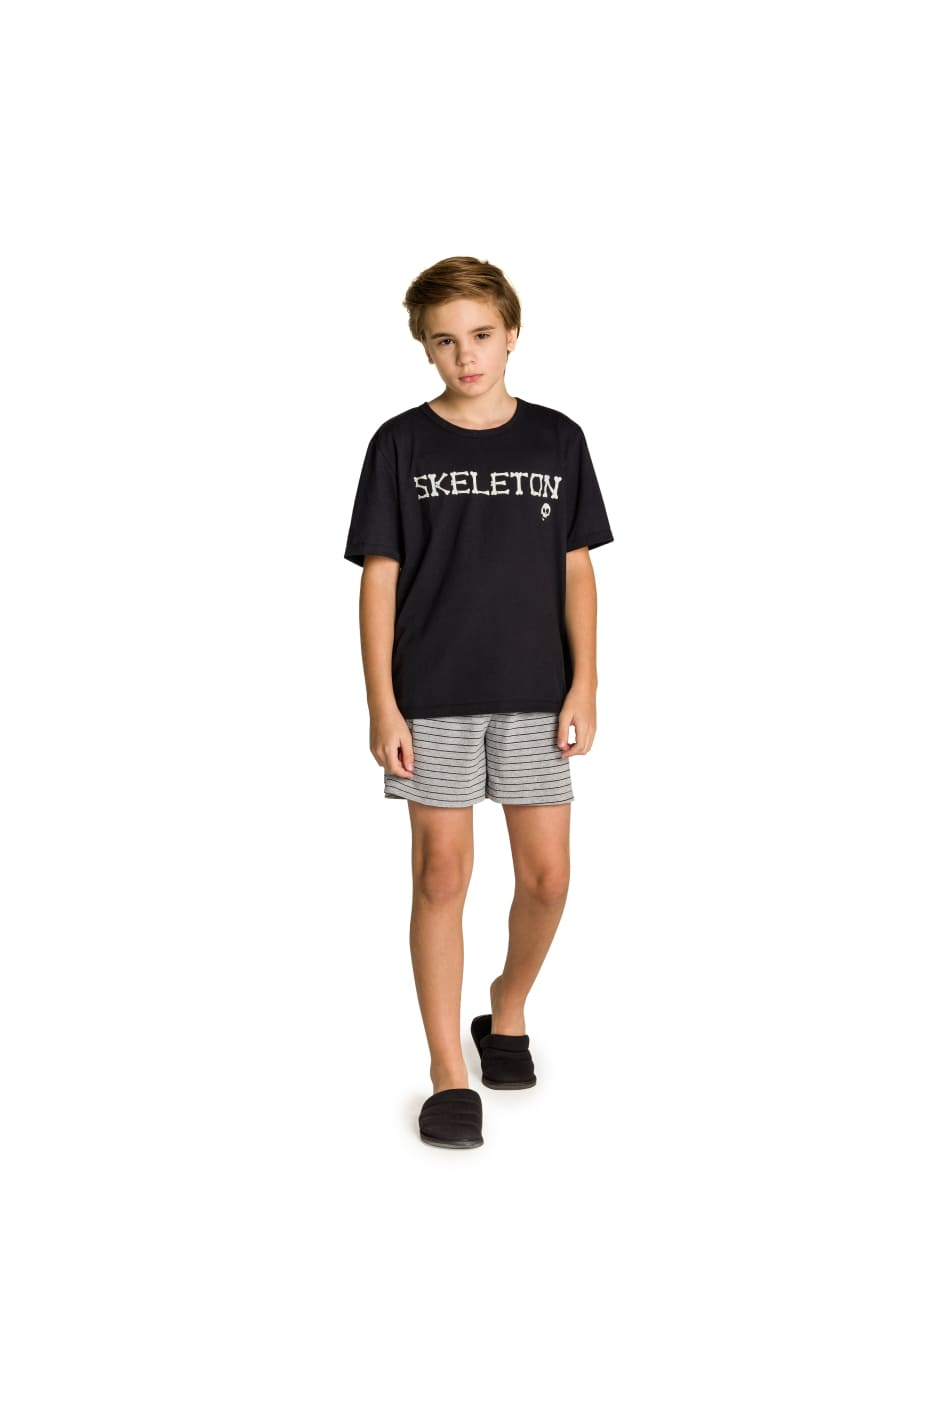 001/E - Pijama Juvenil Masculino Família Skeleton - Brilha no Escuro